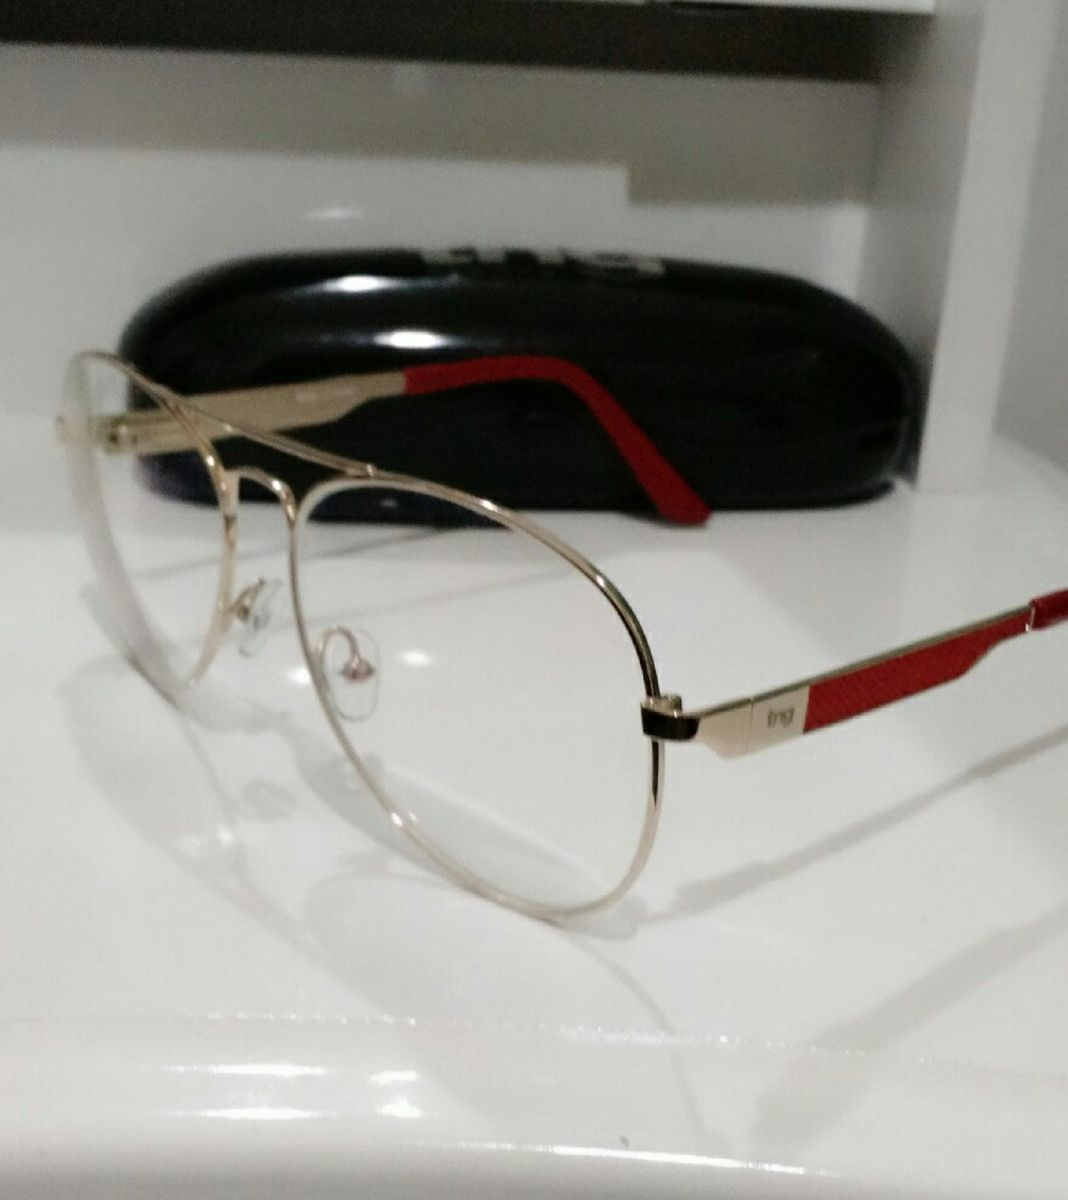 1f7a10c2e4012 armação de óculos tng - óculos tng.  Czm6ly9wag90b3muzw5qb2vplmnvbs5ici9wcm9kdwn0cy80otm1mju2lzi0odaxnznlmzzkodu0nwm3zthhnmm4ndnhnzk1mzq2lmpwzw  ...